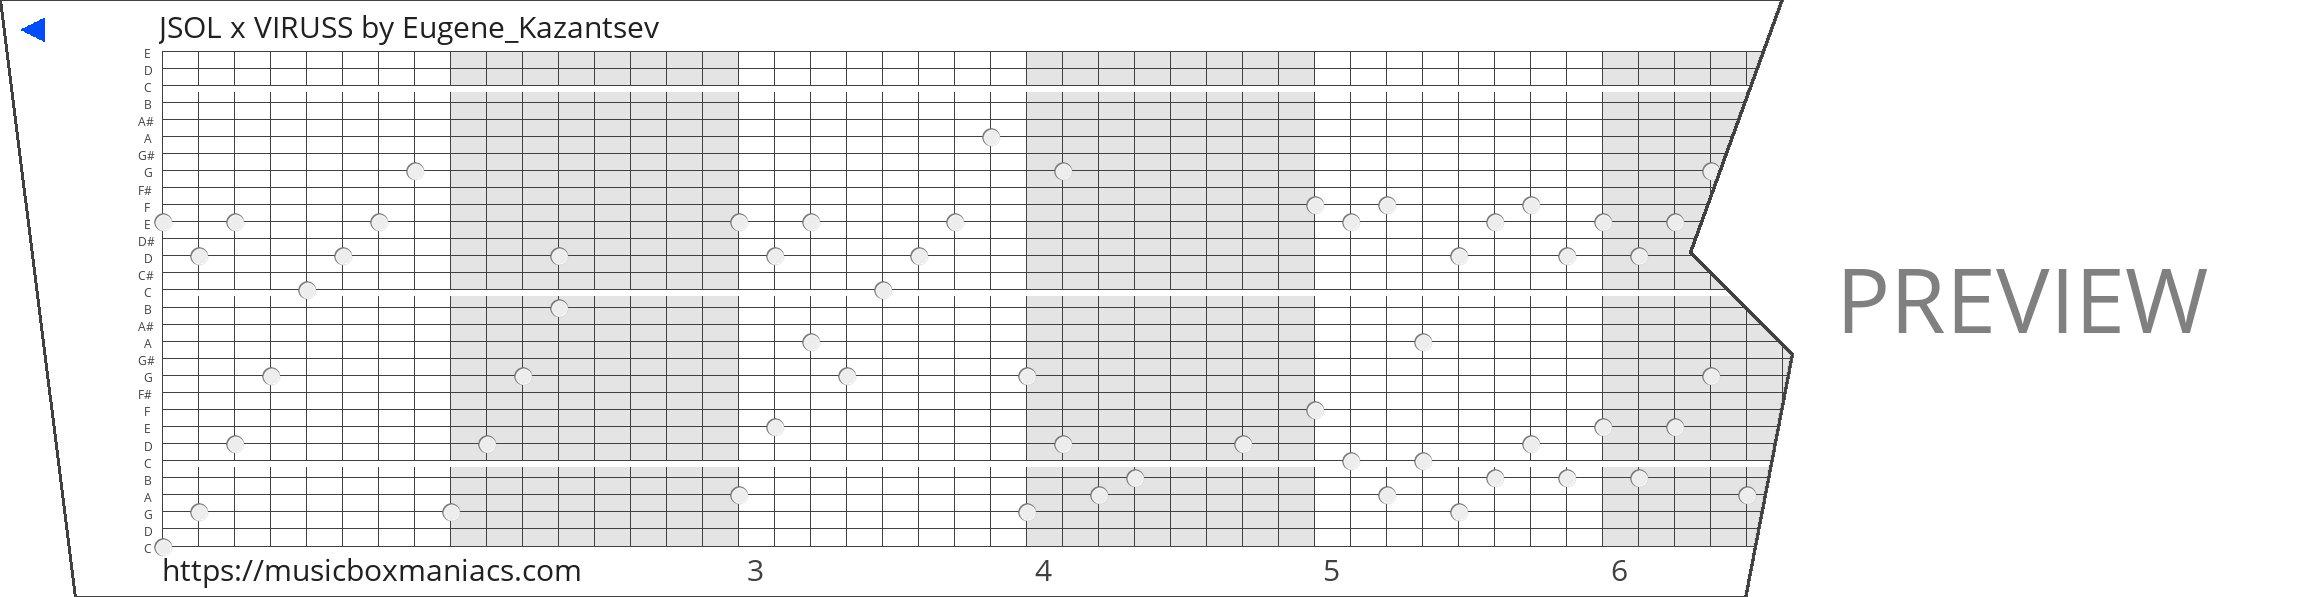 JSOL x VIRUSS 30 note music box paper strip